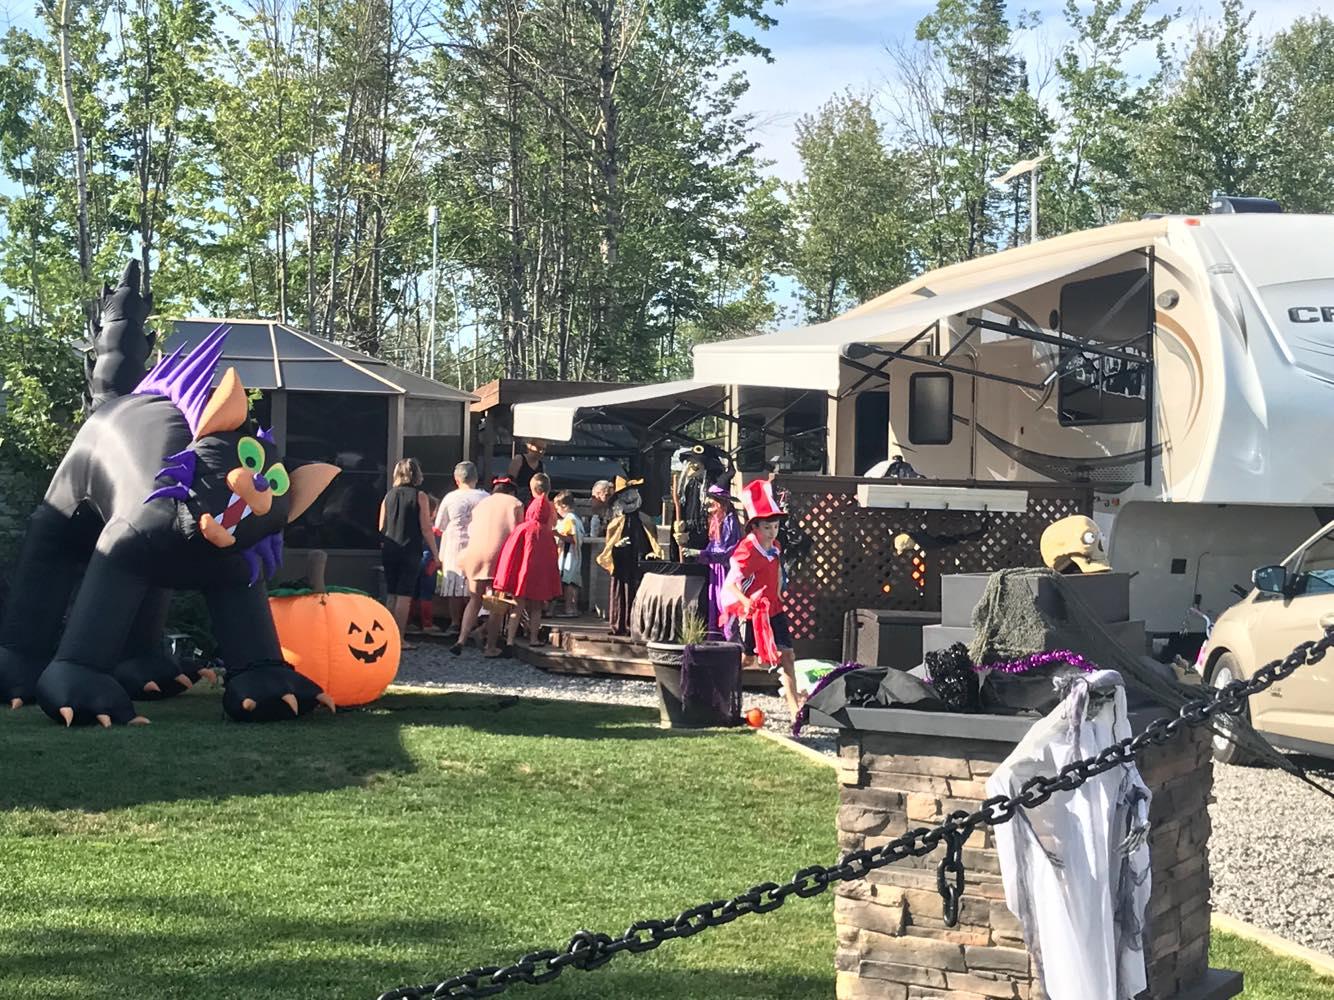 http://www.campingatlantide.com/wp-content/uploads/2018/08/halloween-complexe-atlantide-2018-26.jpg